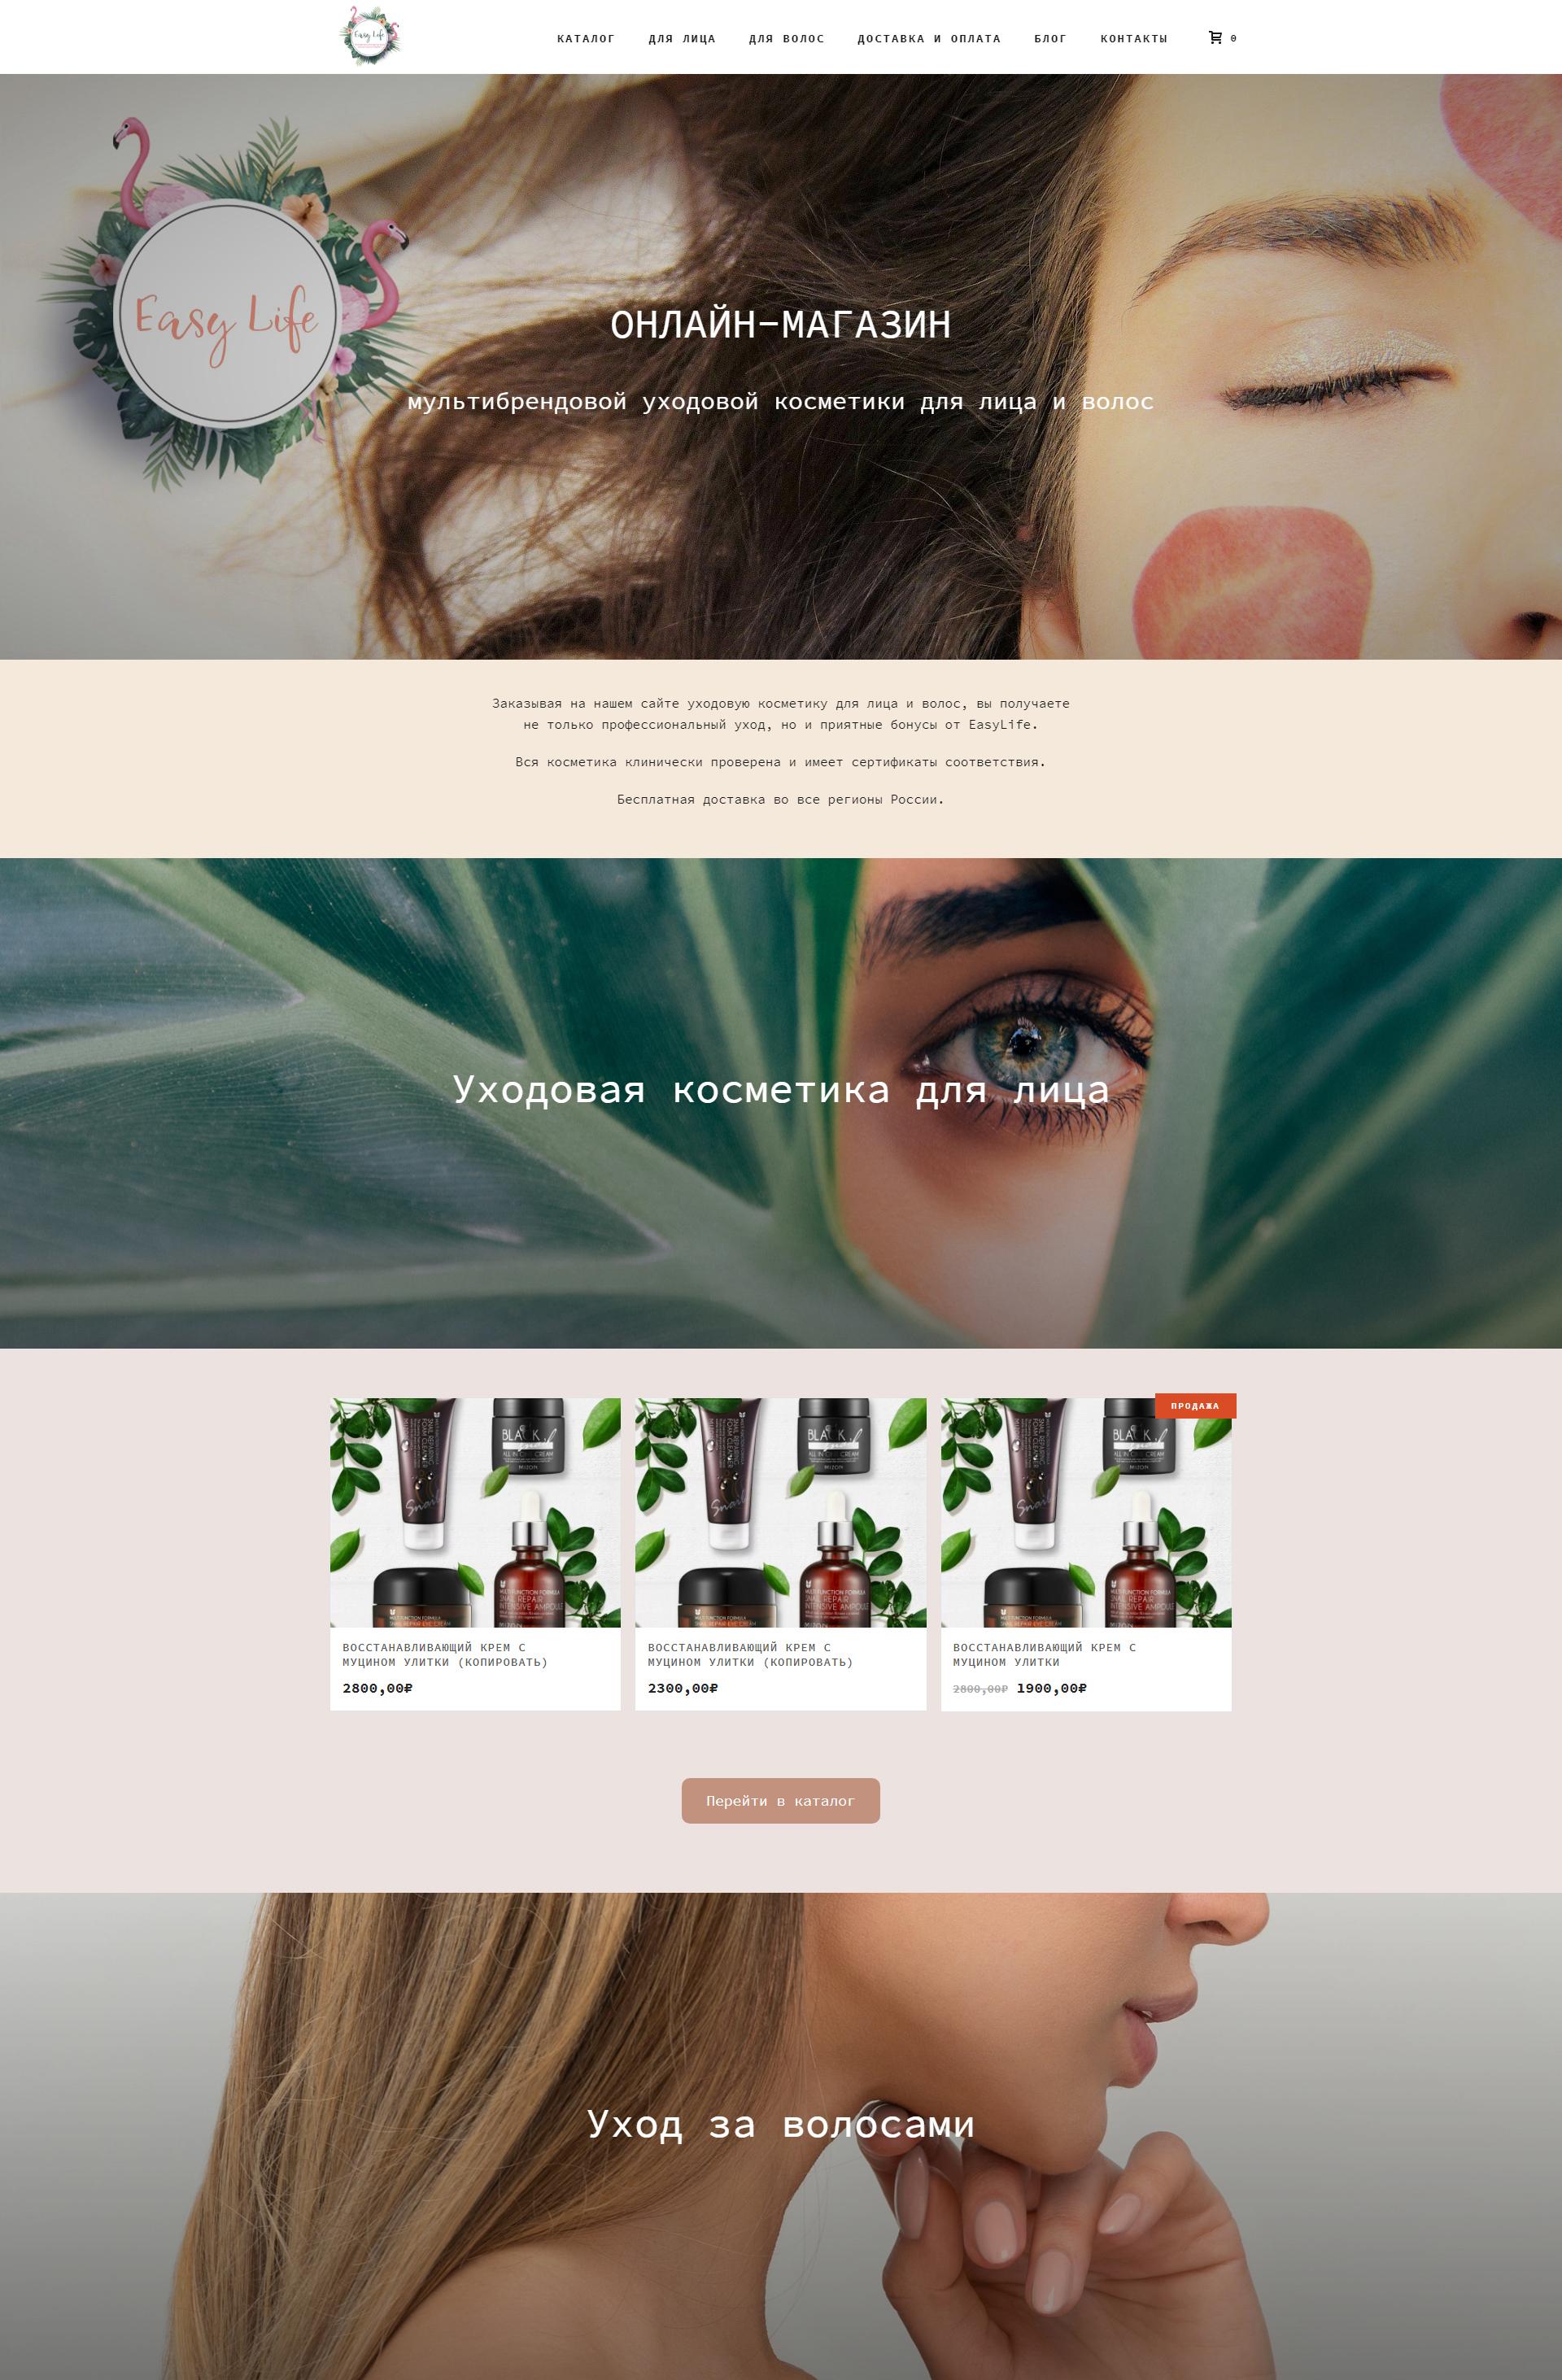 screencapture-cosmetic-easylife-ru-2020-07-03-17_40_44